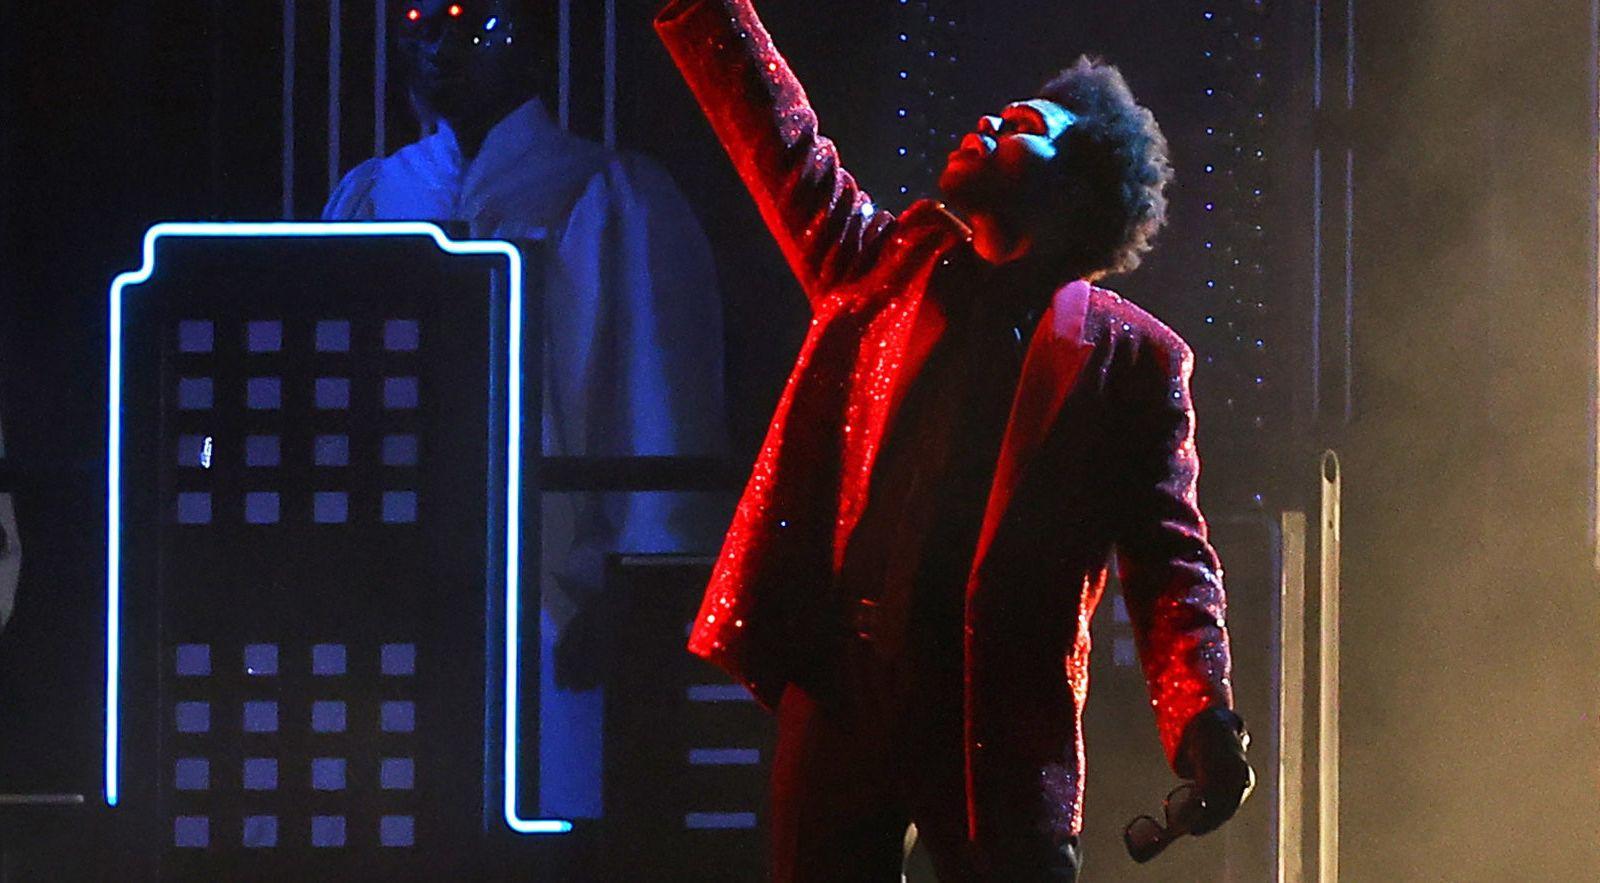 Super Bowl 2021: Το εντυπωσιακό show του The Weeknd στο πιο διάσημο ημίχρονο αγώνων [vid]